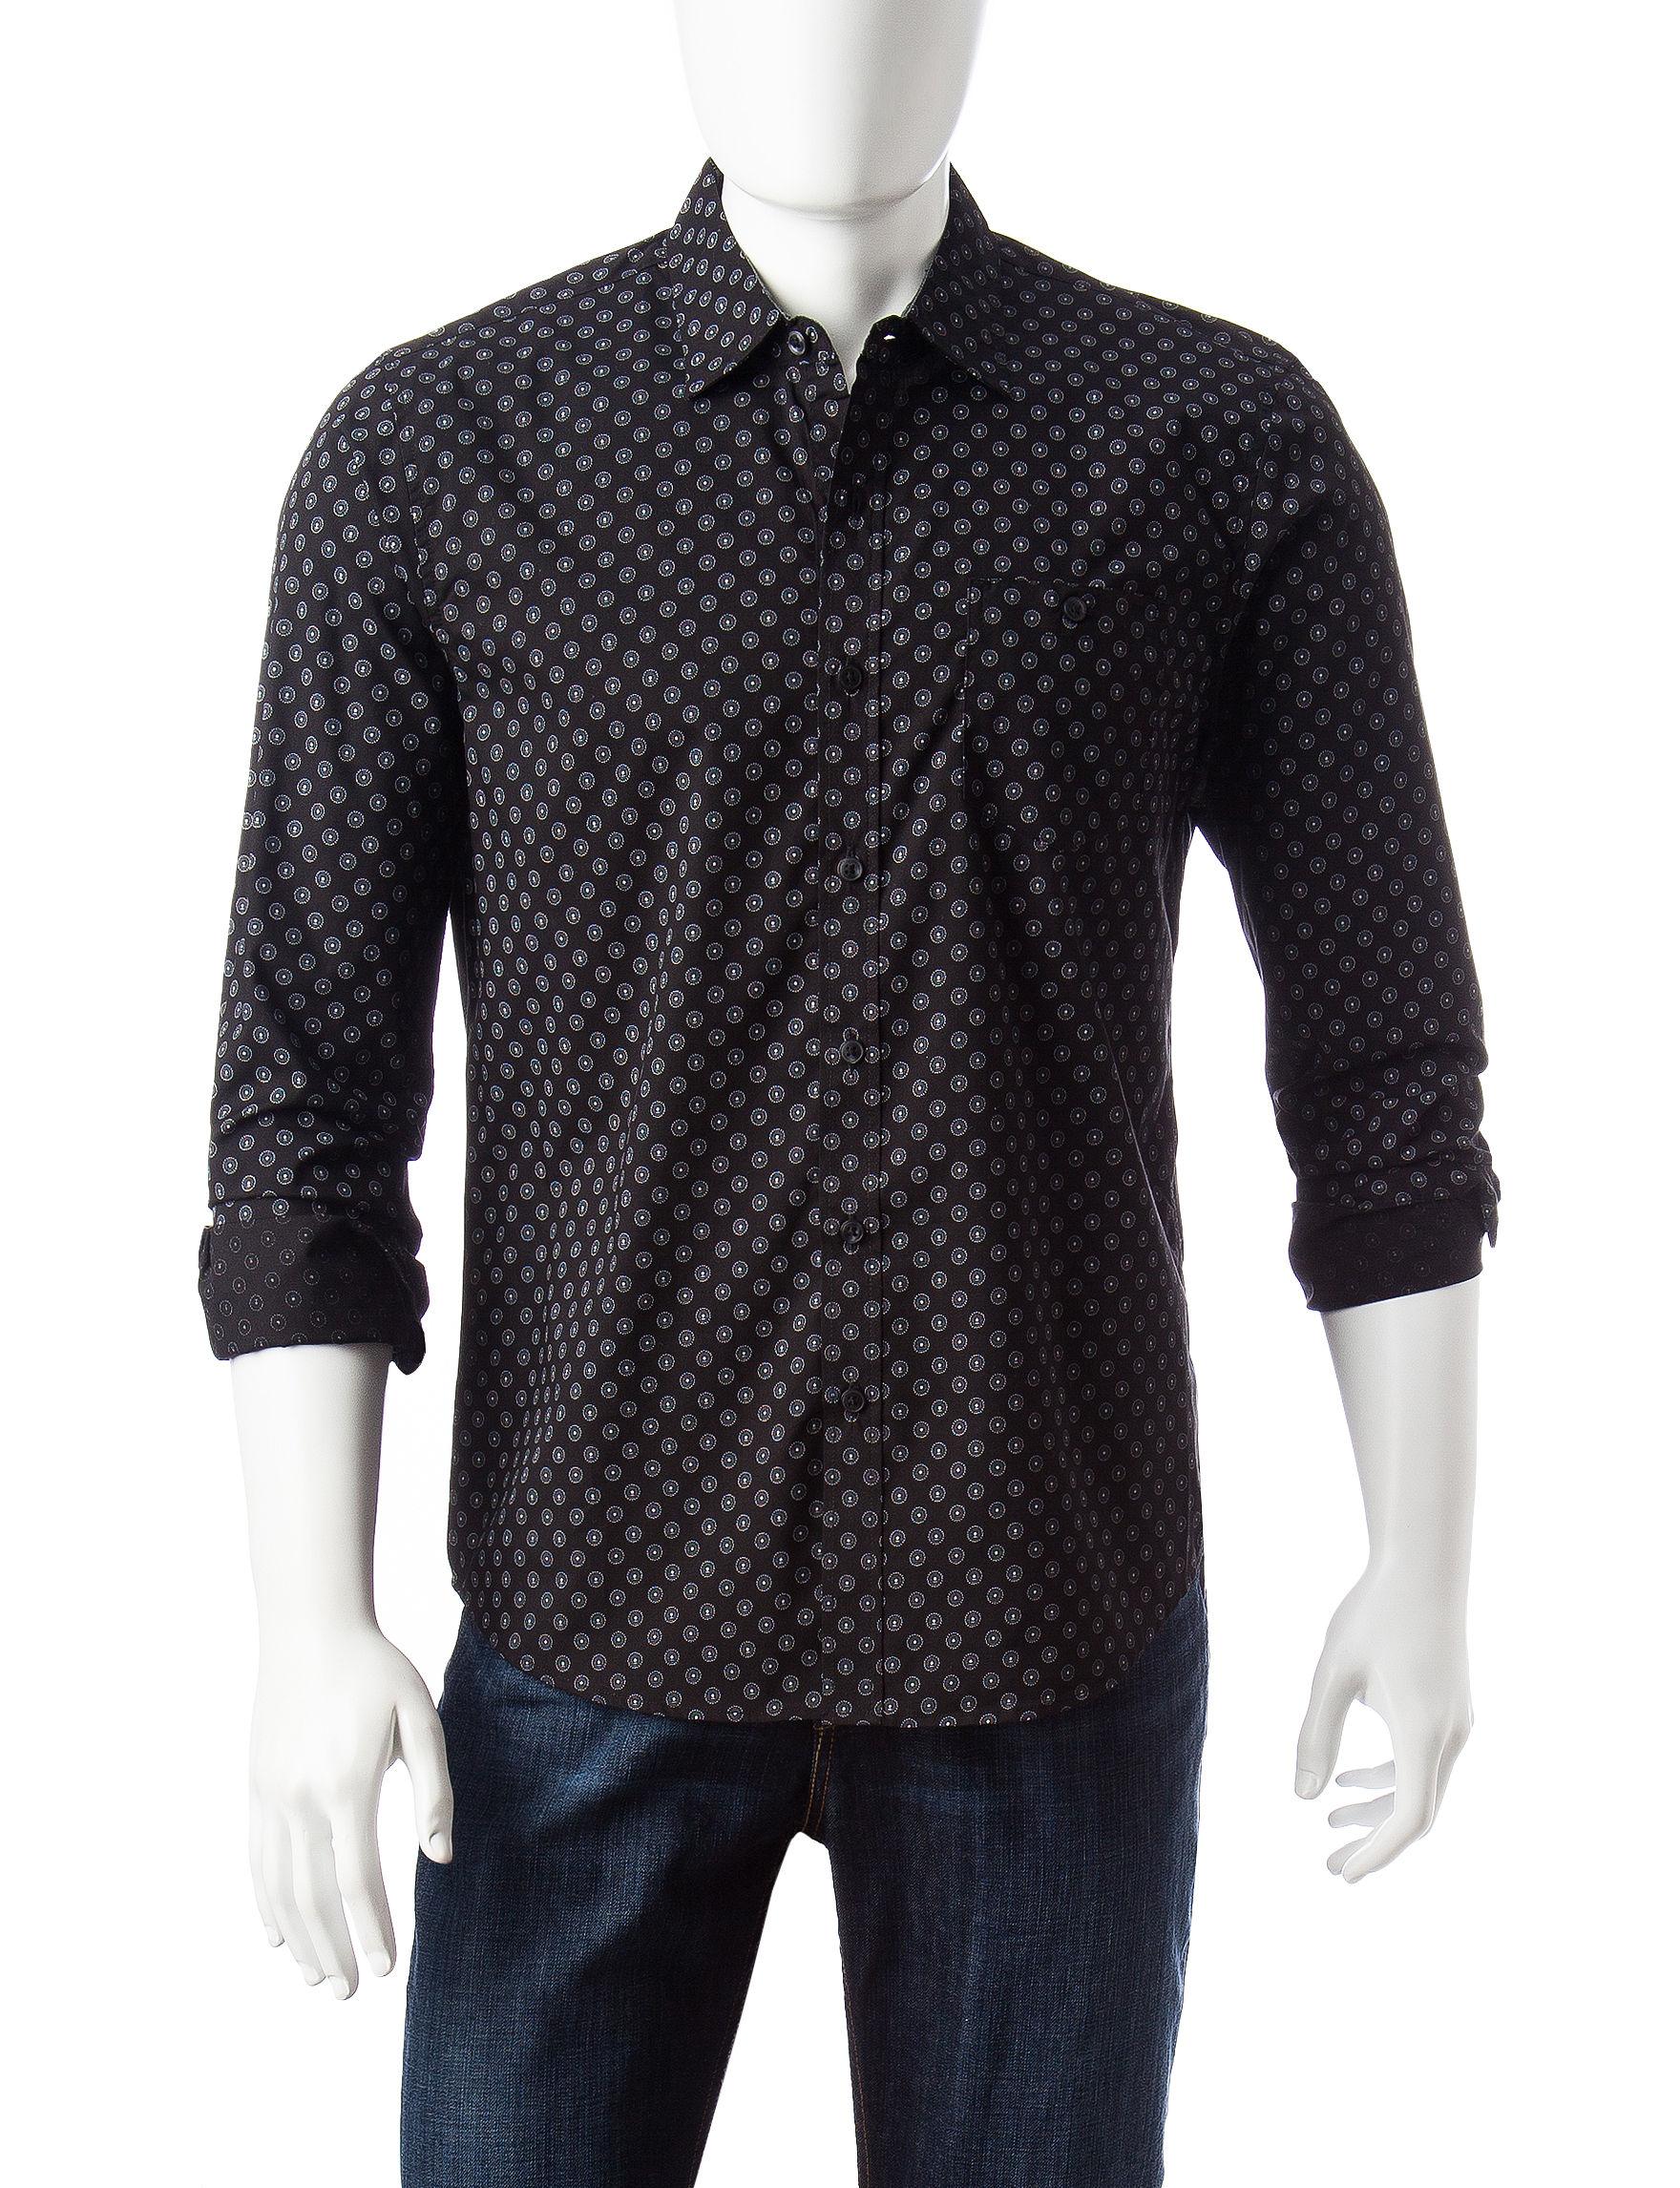 Signature Studio Black Casual Button Down Shirts